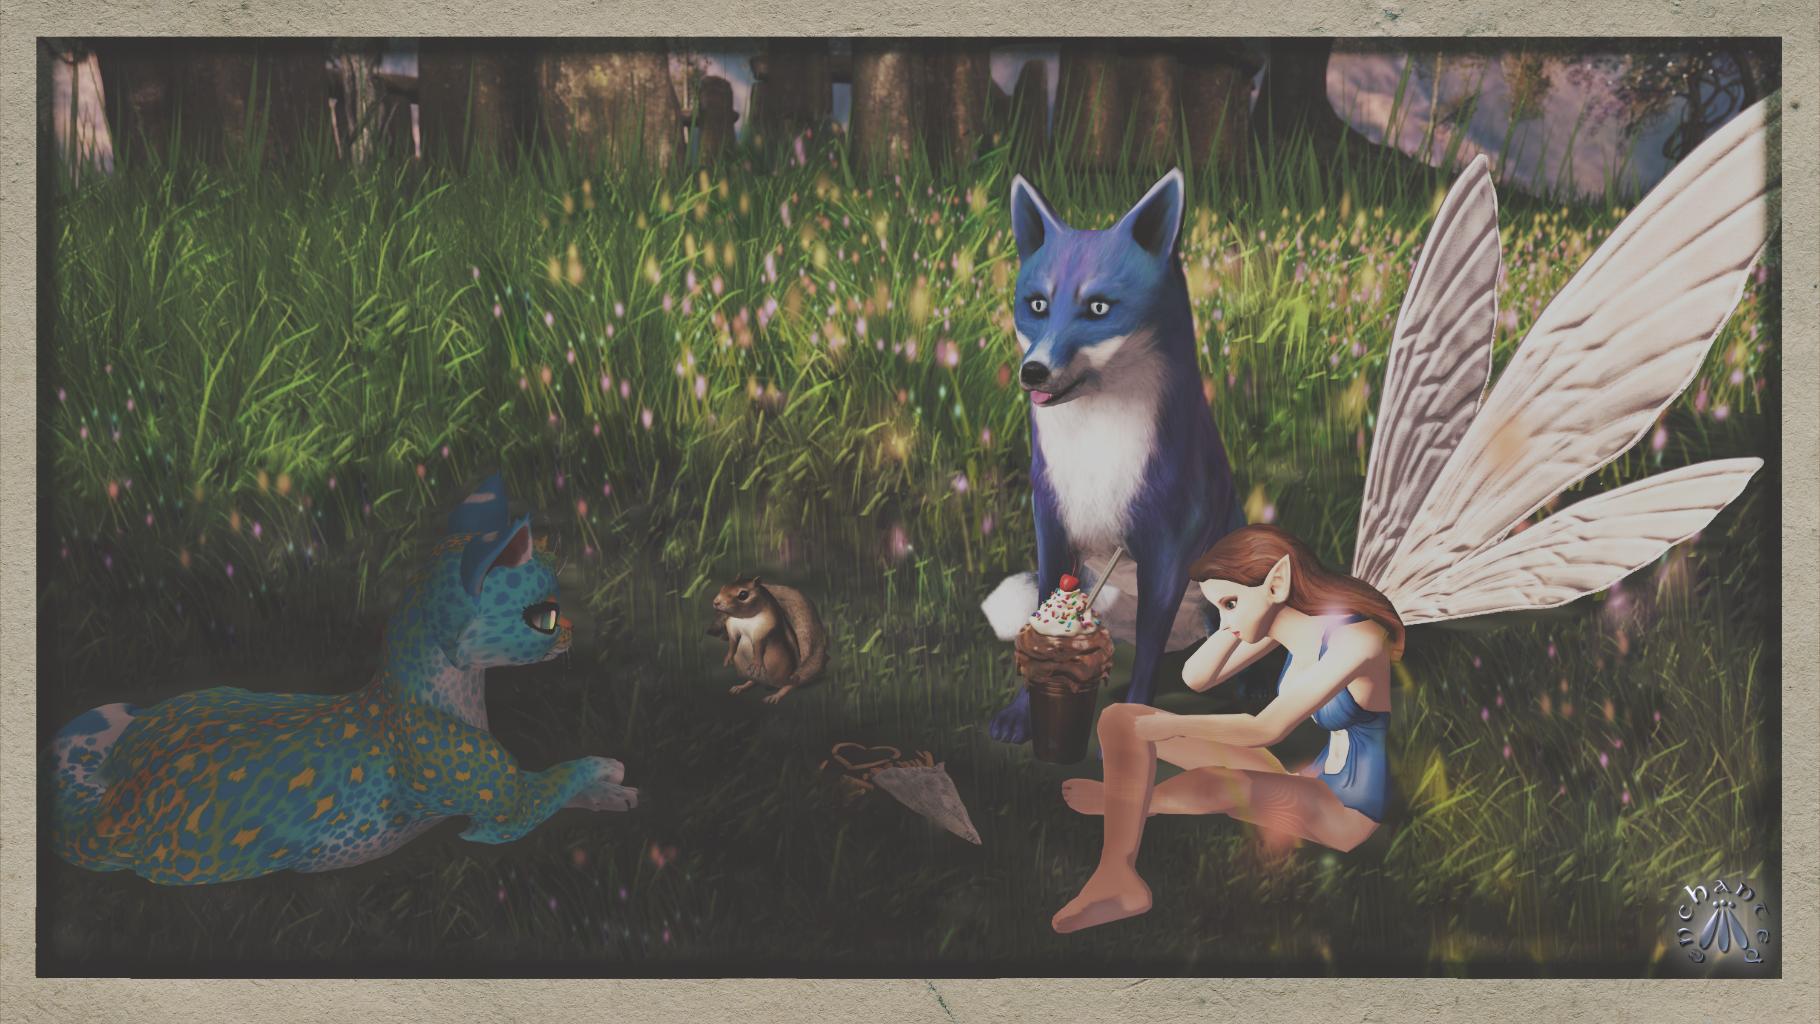 enchantment kitsune 3 edit - 7 BLOG